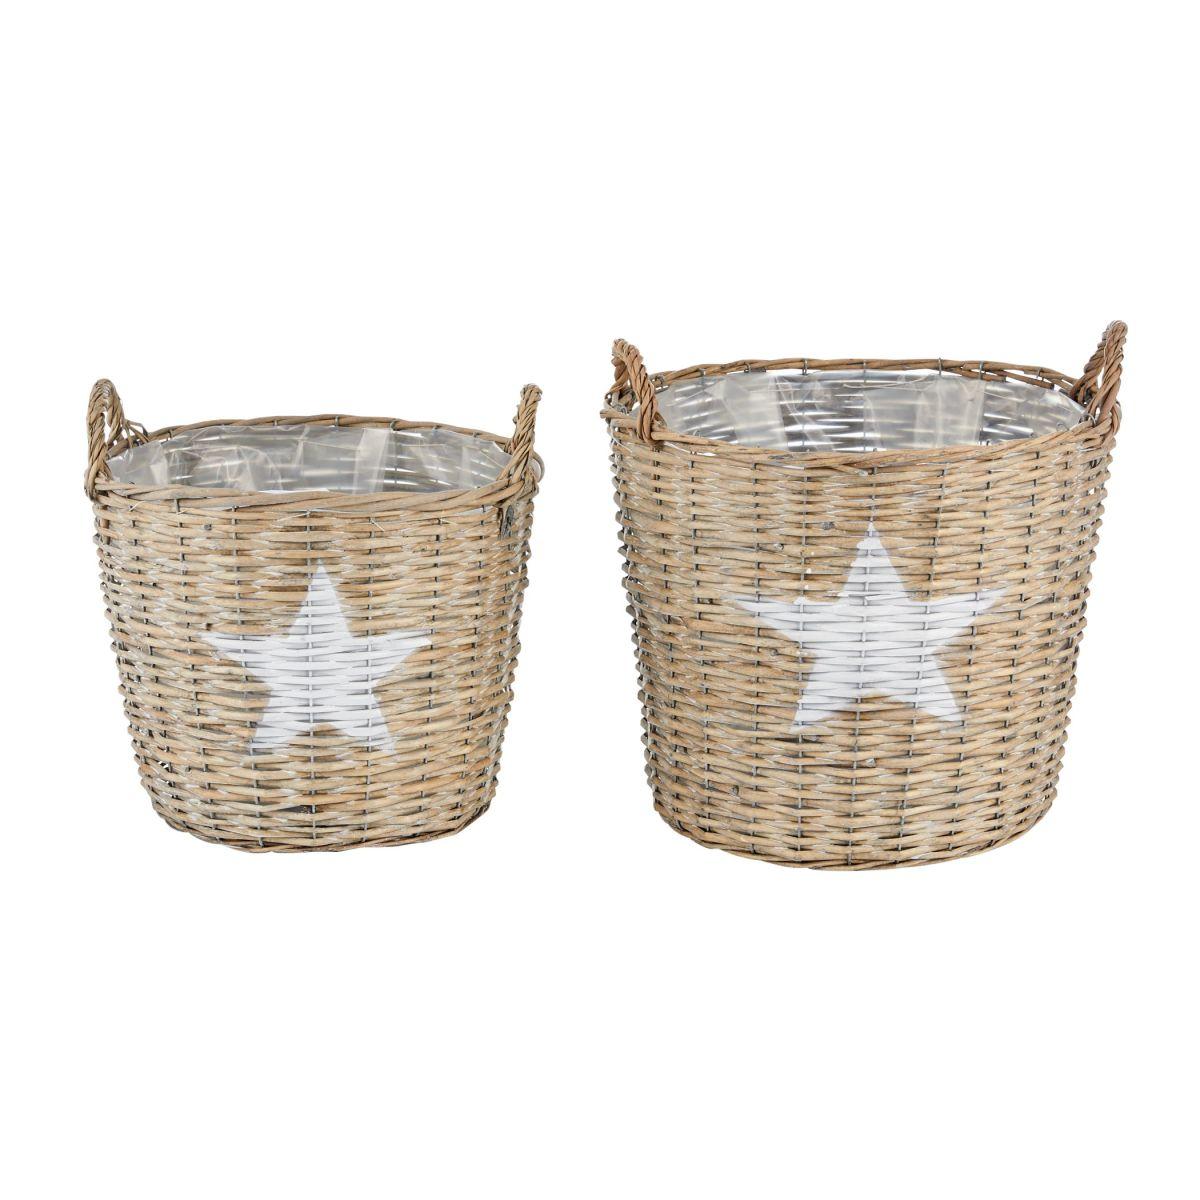 Korb-Set, 2-tlg. Stella, Country-Style, Rattan